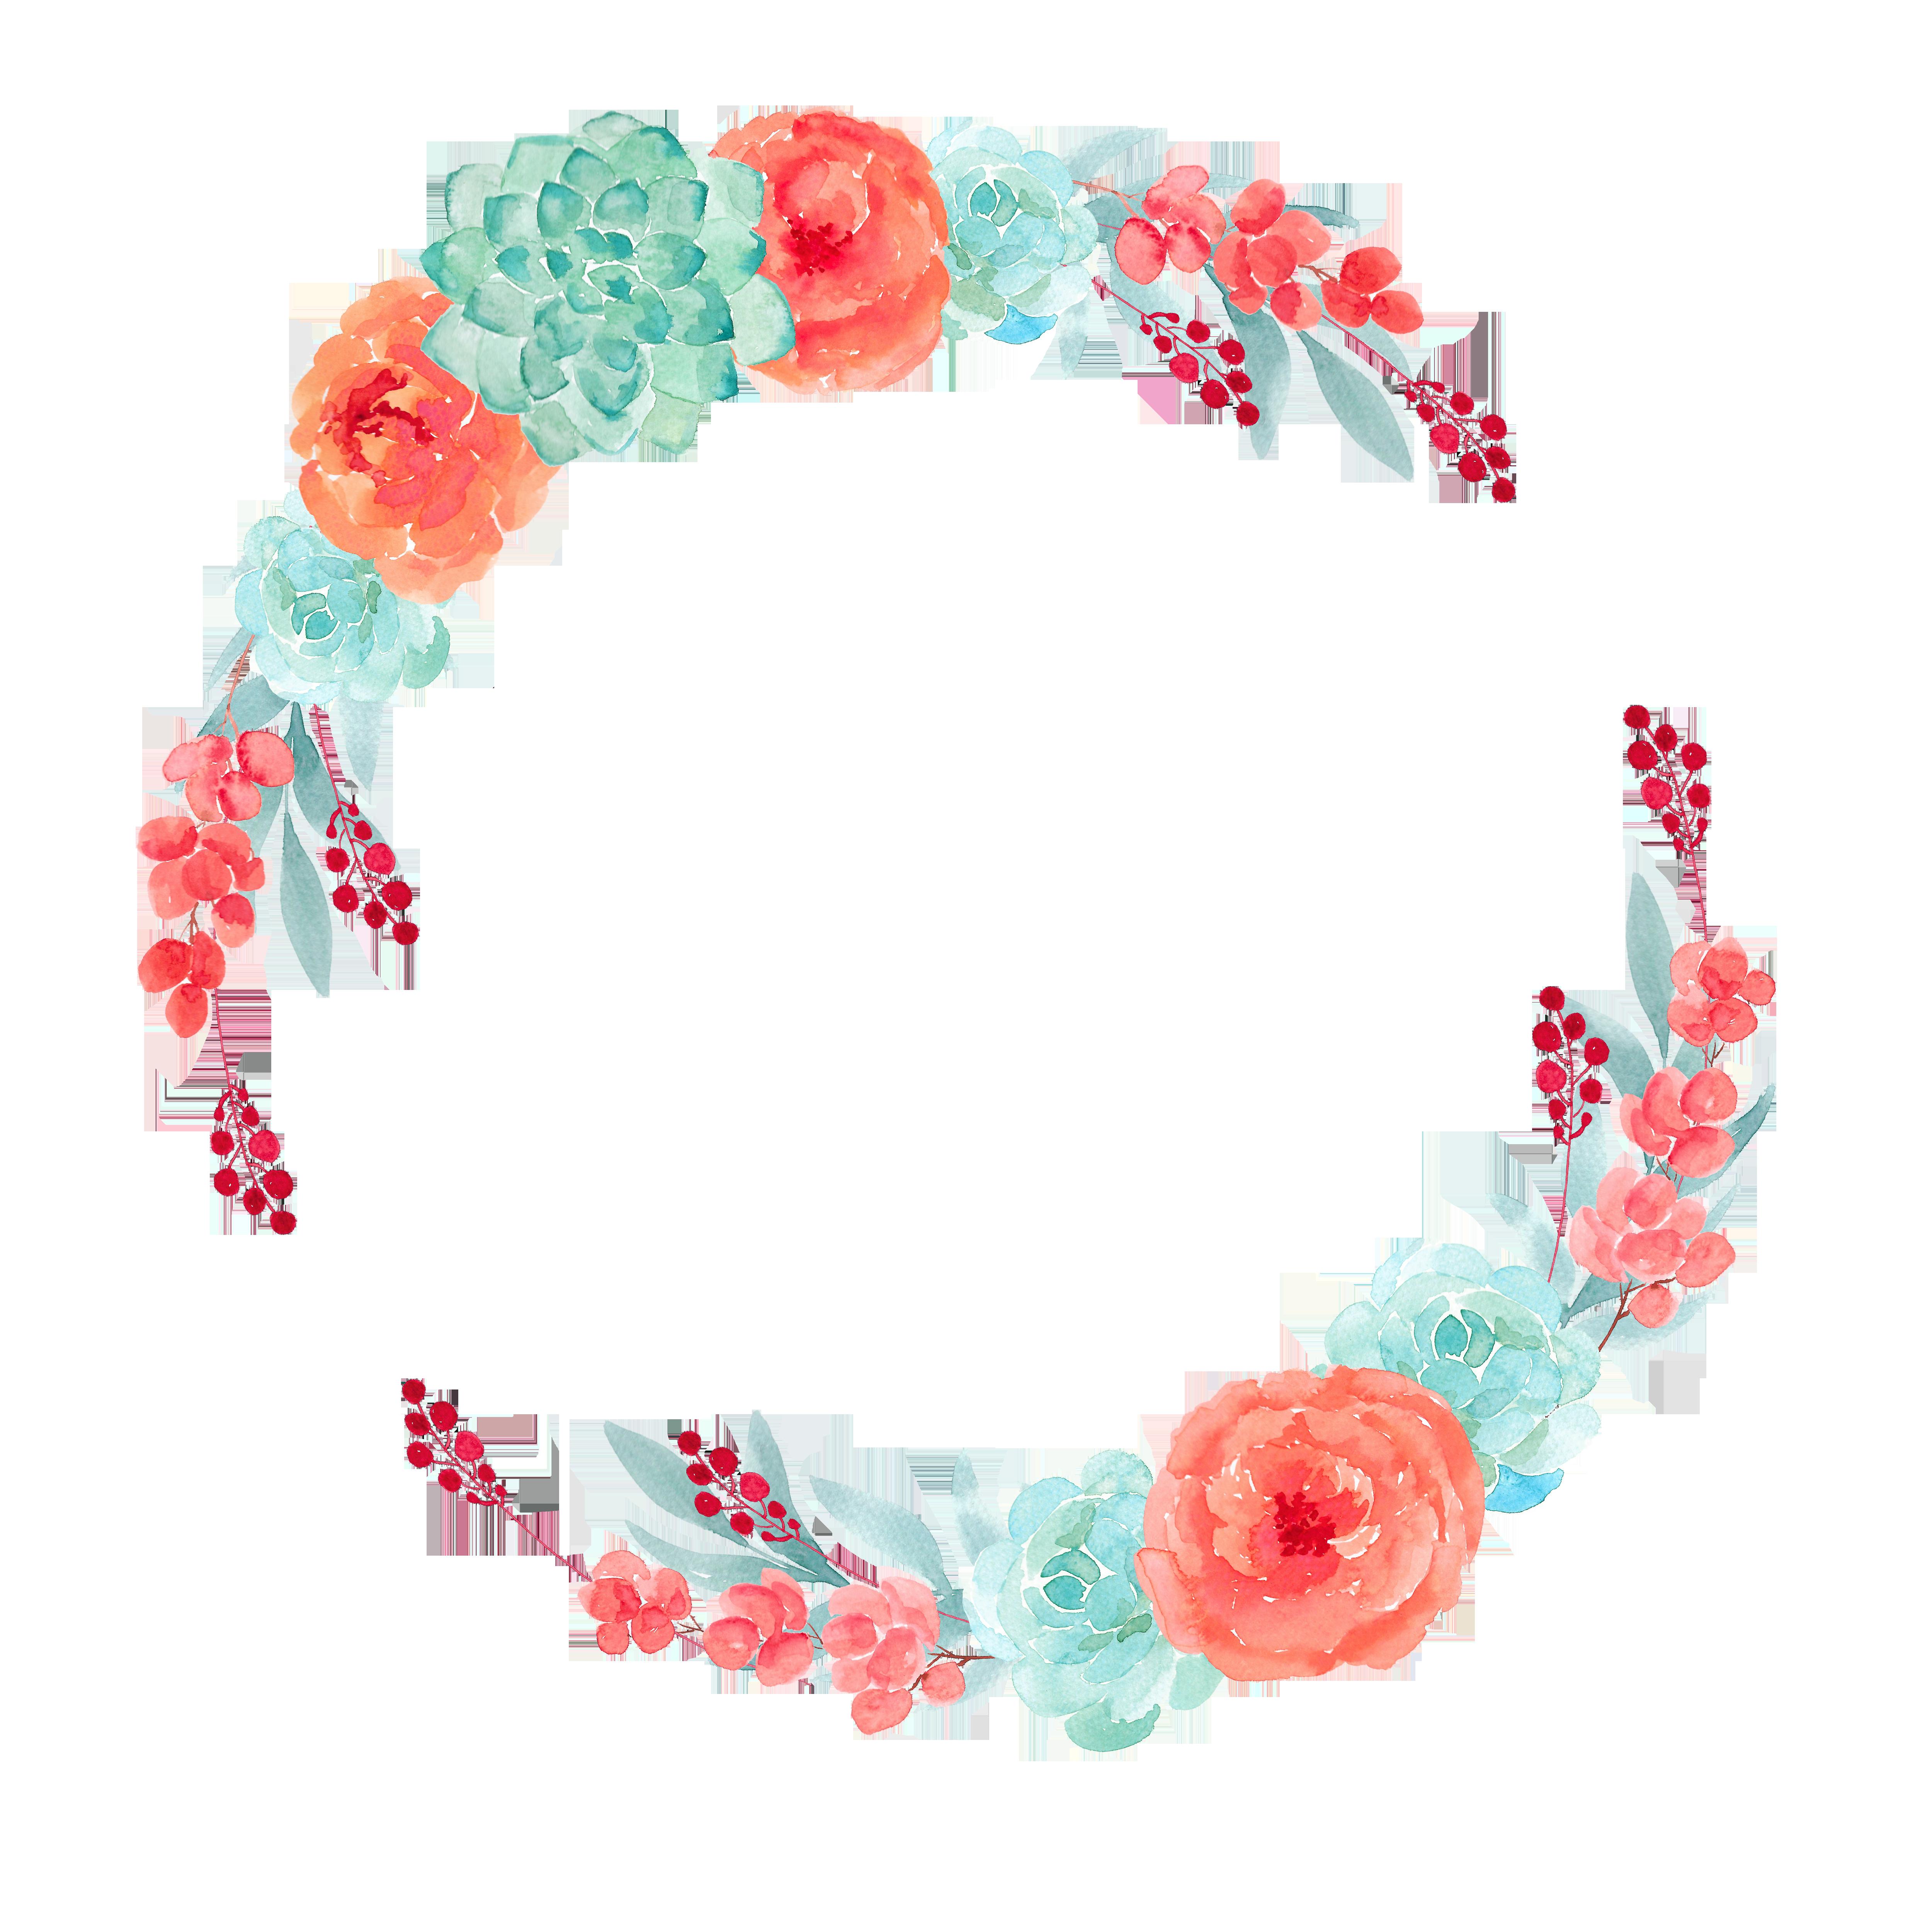 Watercolor snowflake wreath clipart jpg library download http://img.lenagold.ru/p/pion/pion184.png | plantillas y fondos ... jpg library download